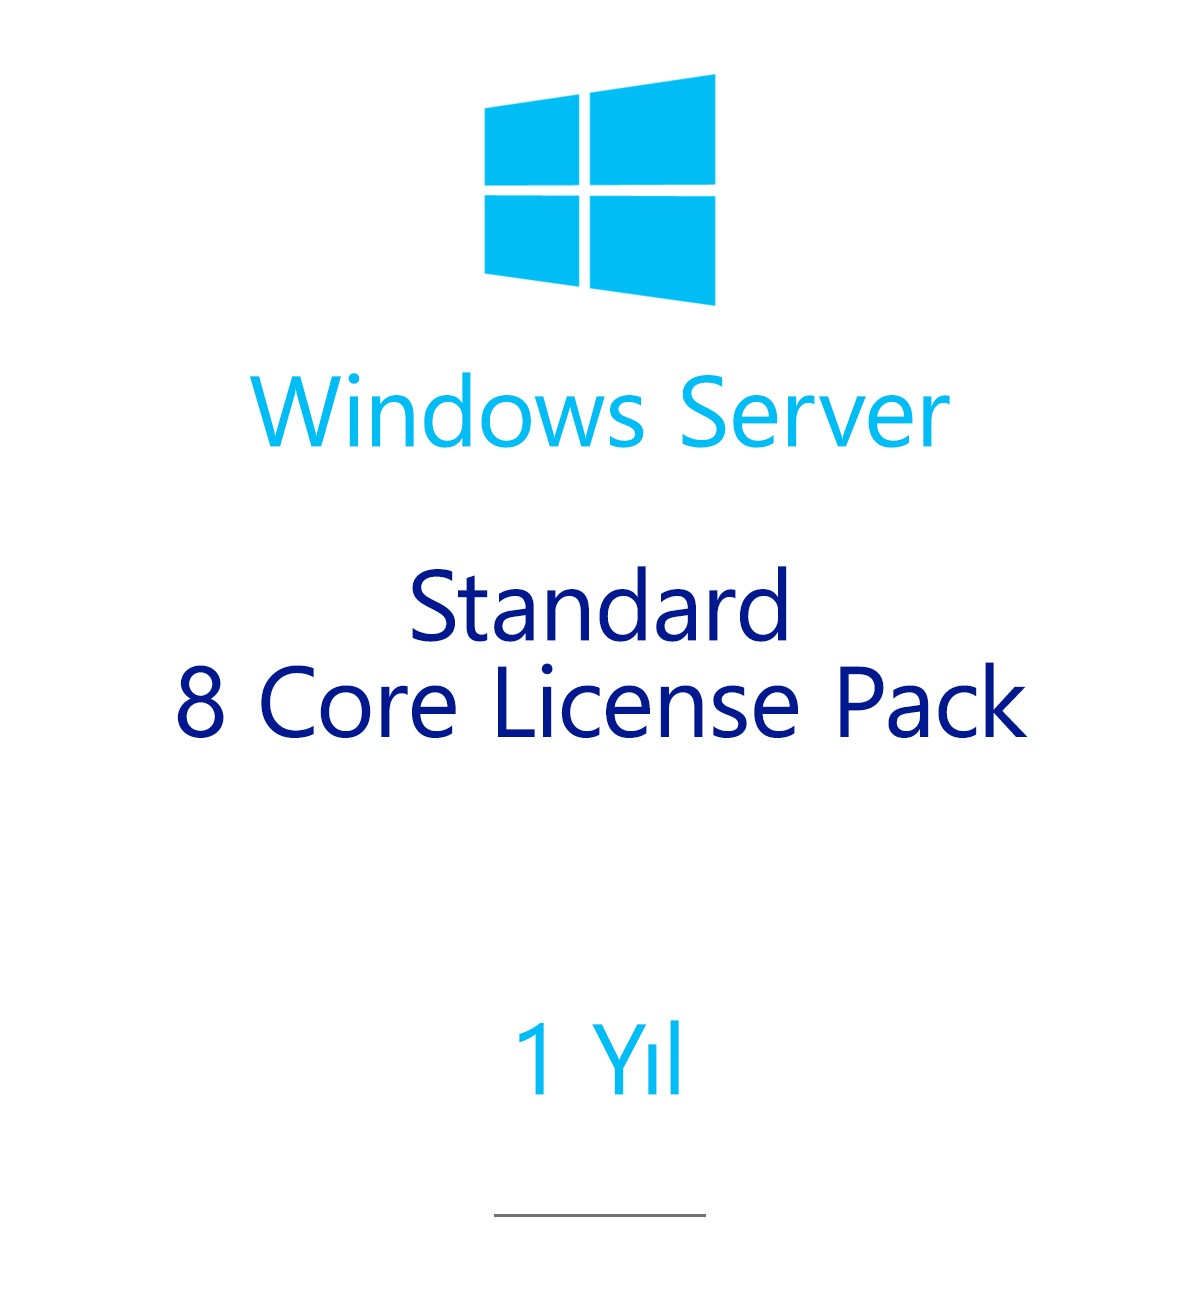 Windows Server Standard 8 Core License Pack 1 year